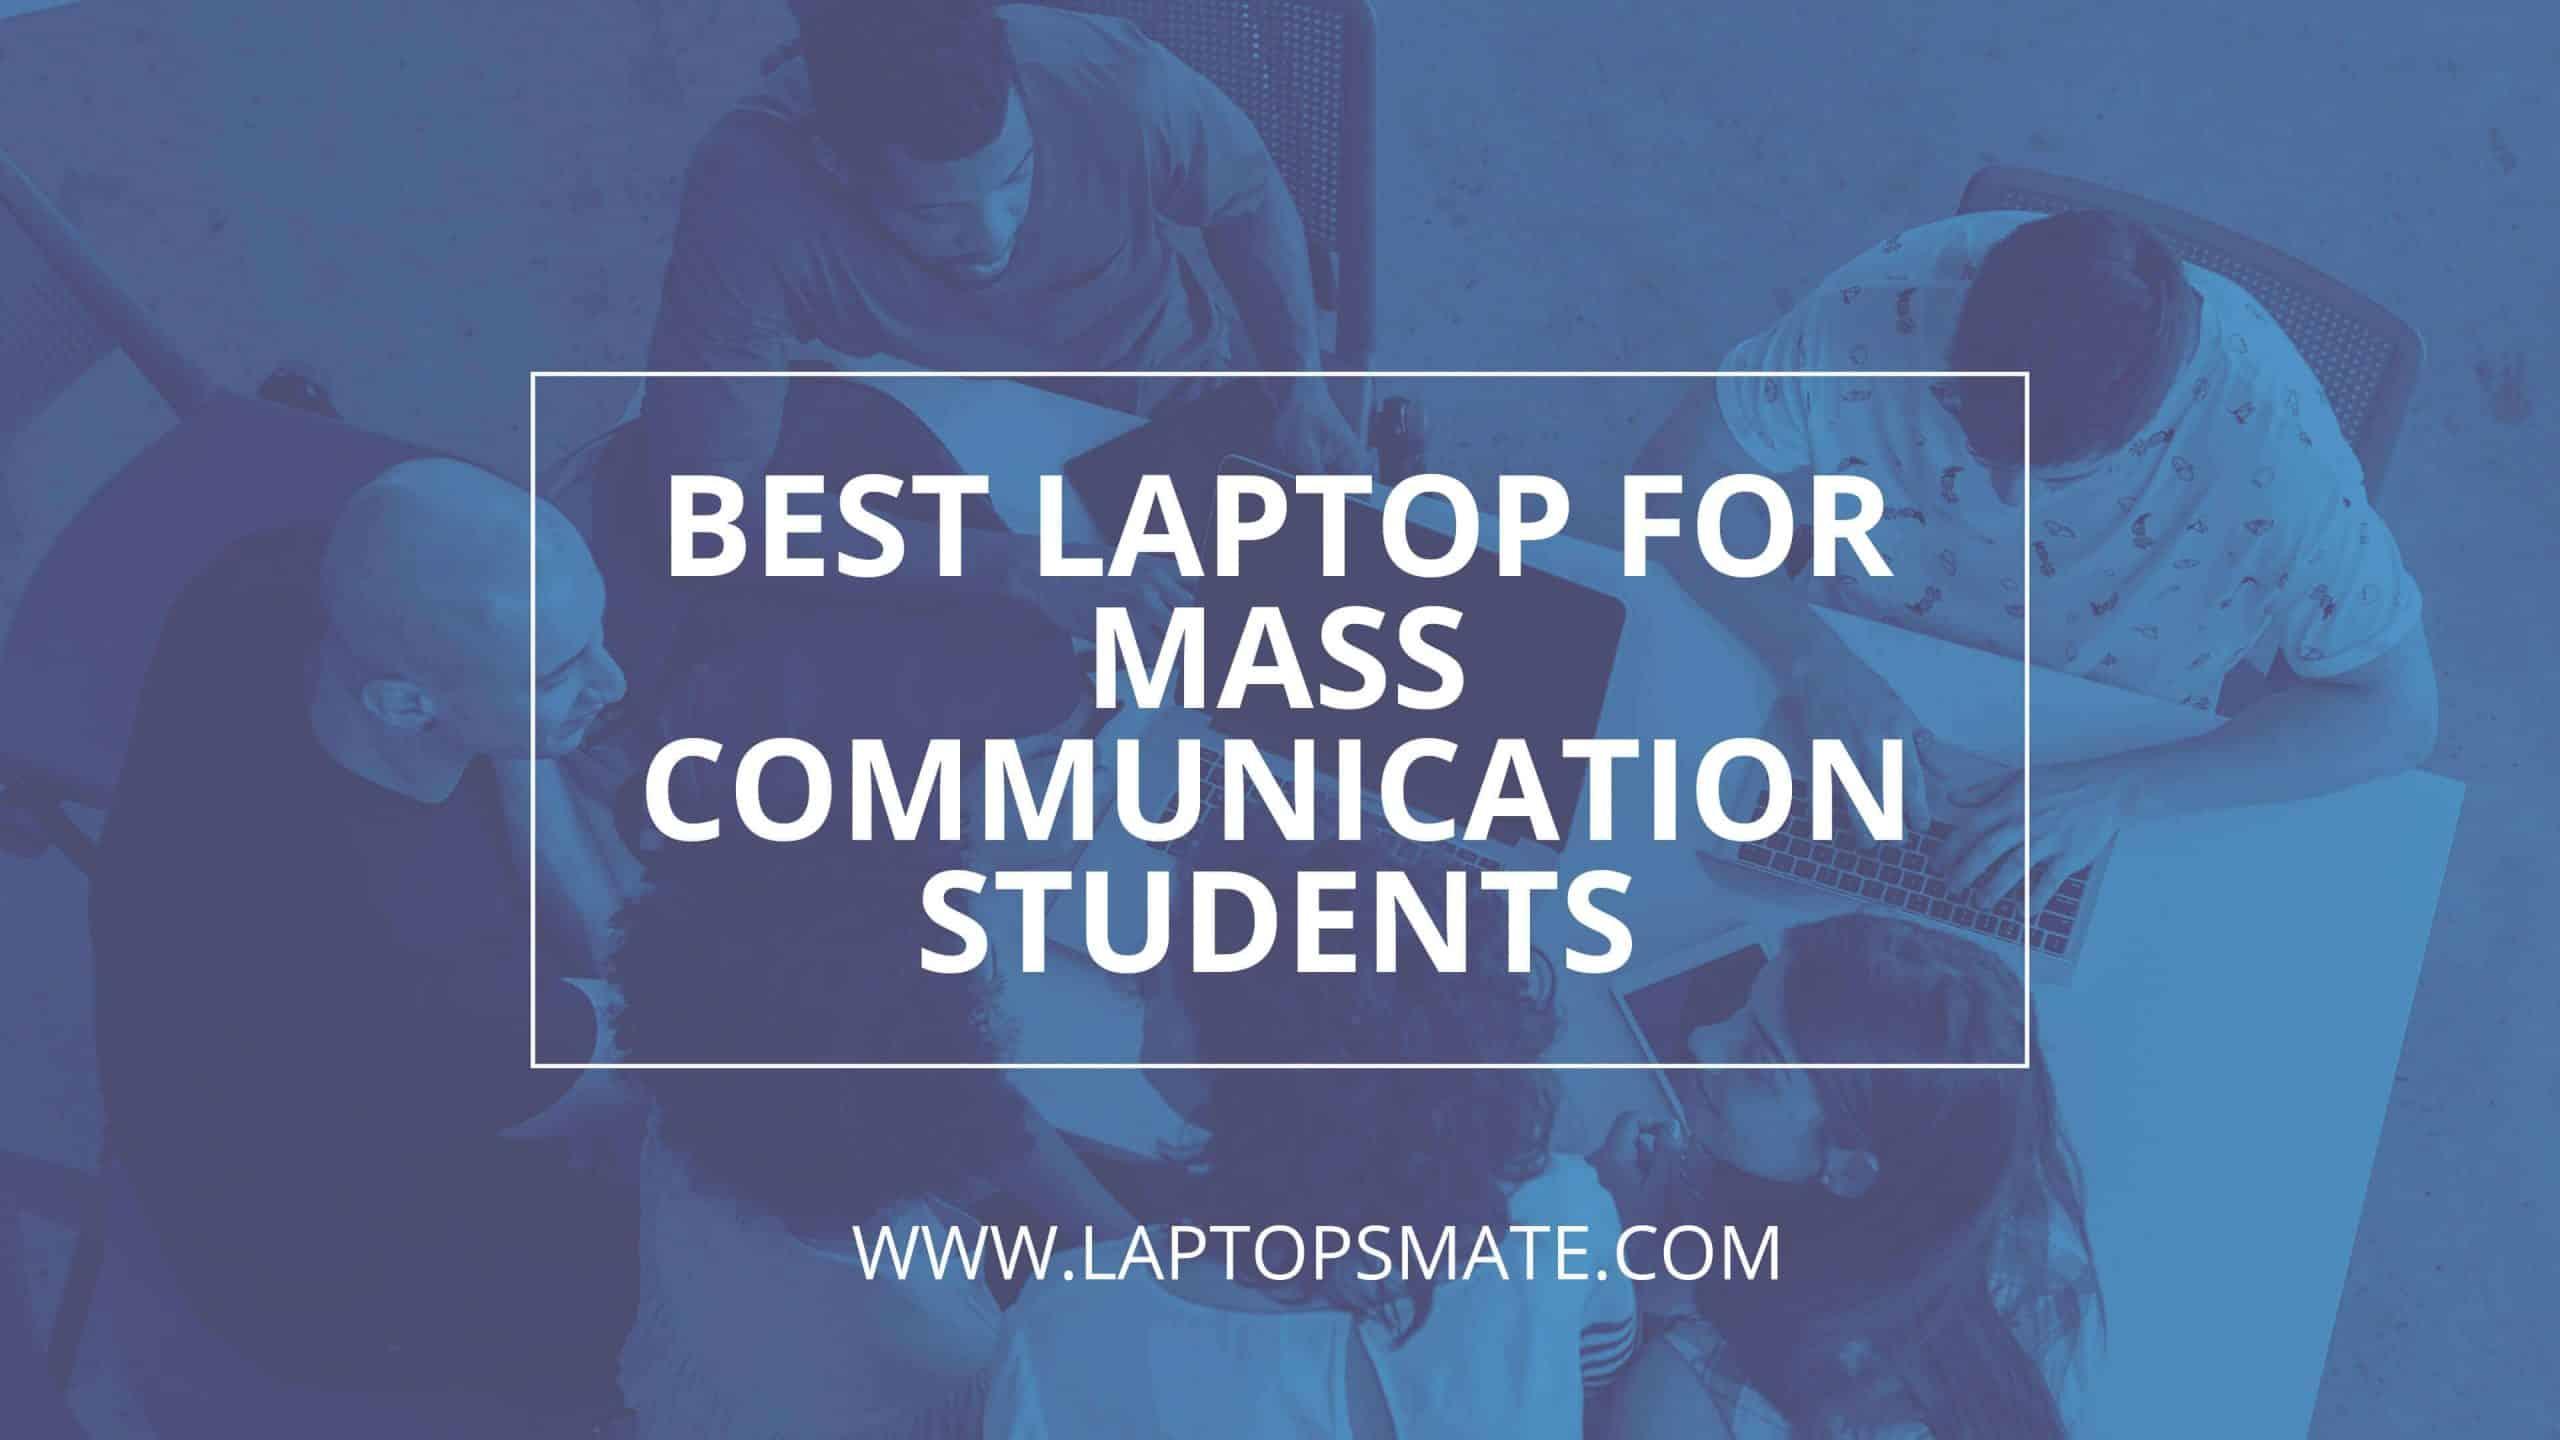 Best Laptop for Mass Communication Students